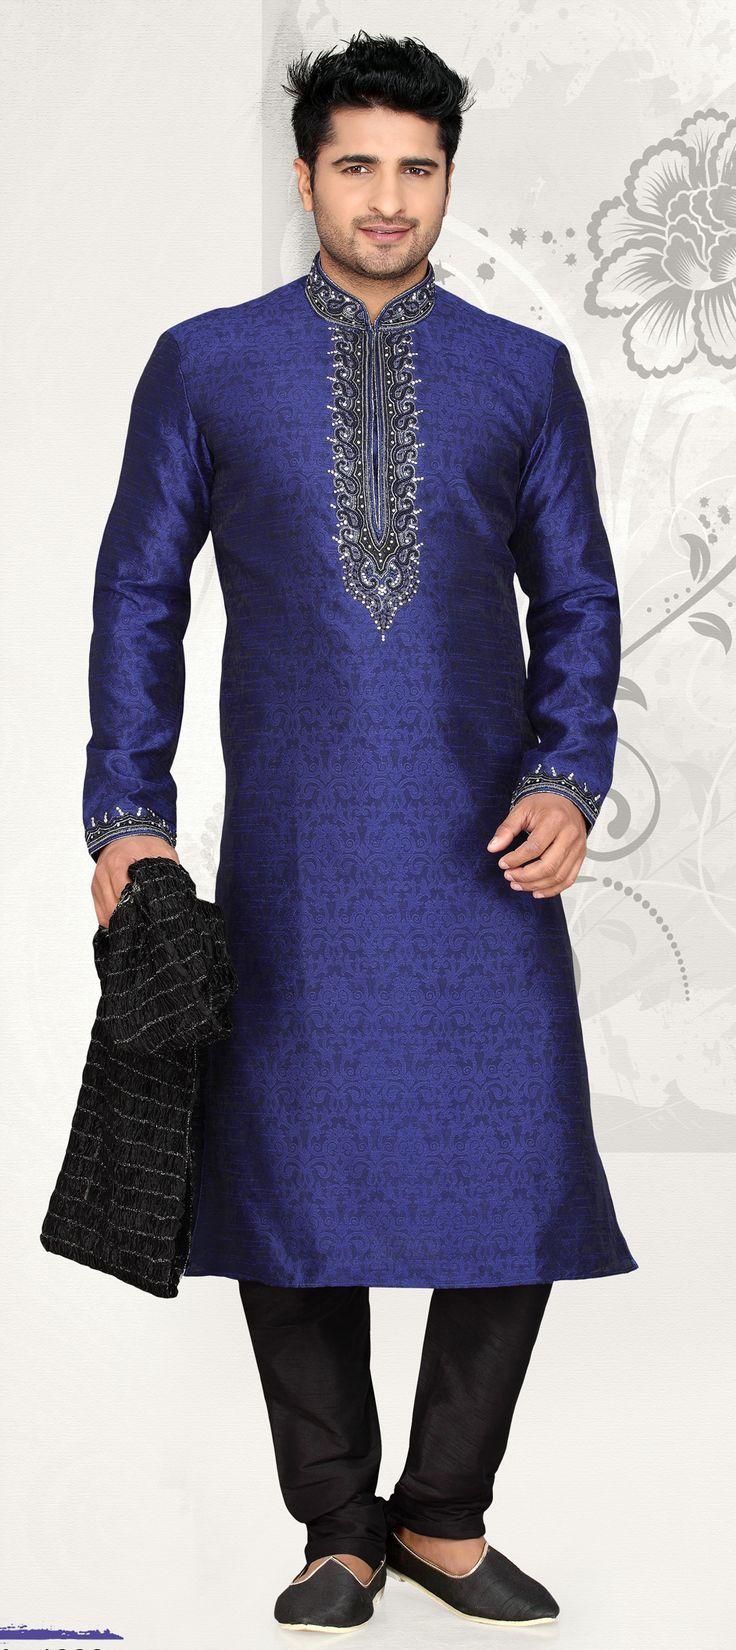 501323: Blue color family Kurta Pyjamas.  Fabric: Brocade, Jacquard Work: Bugle…